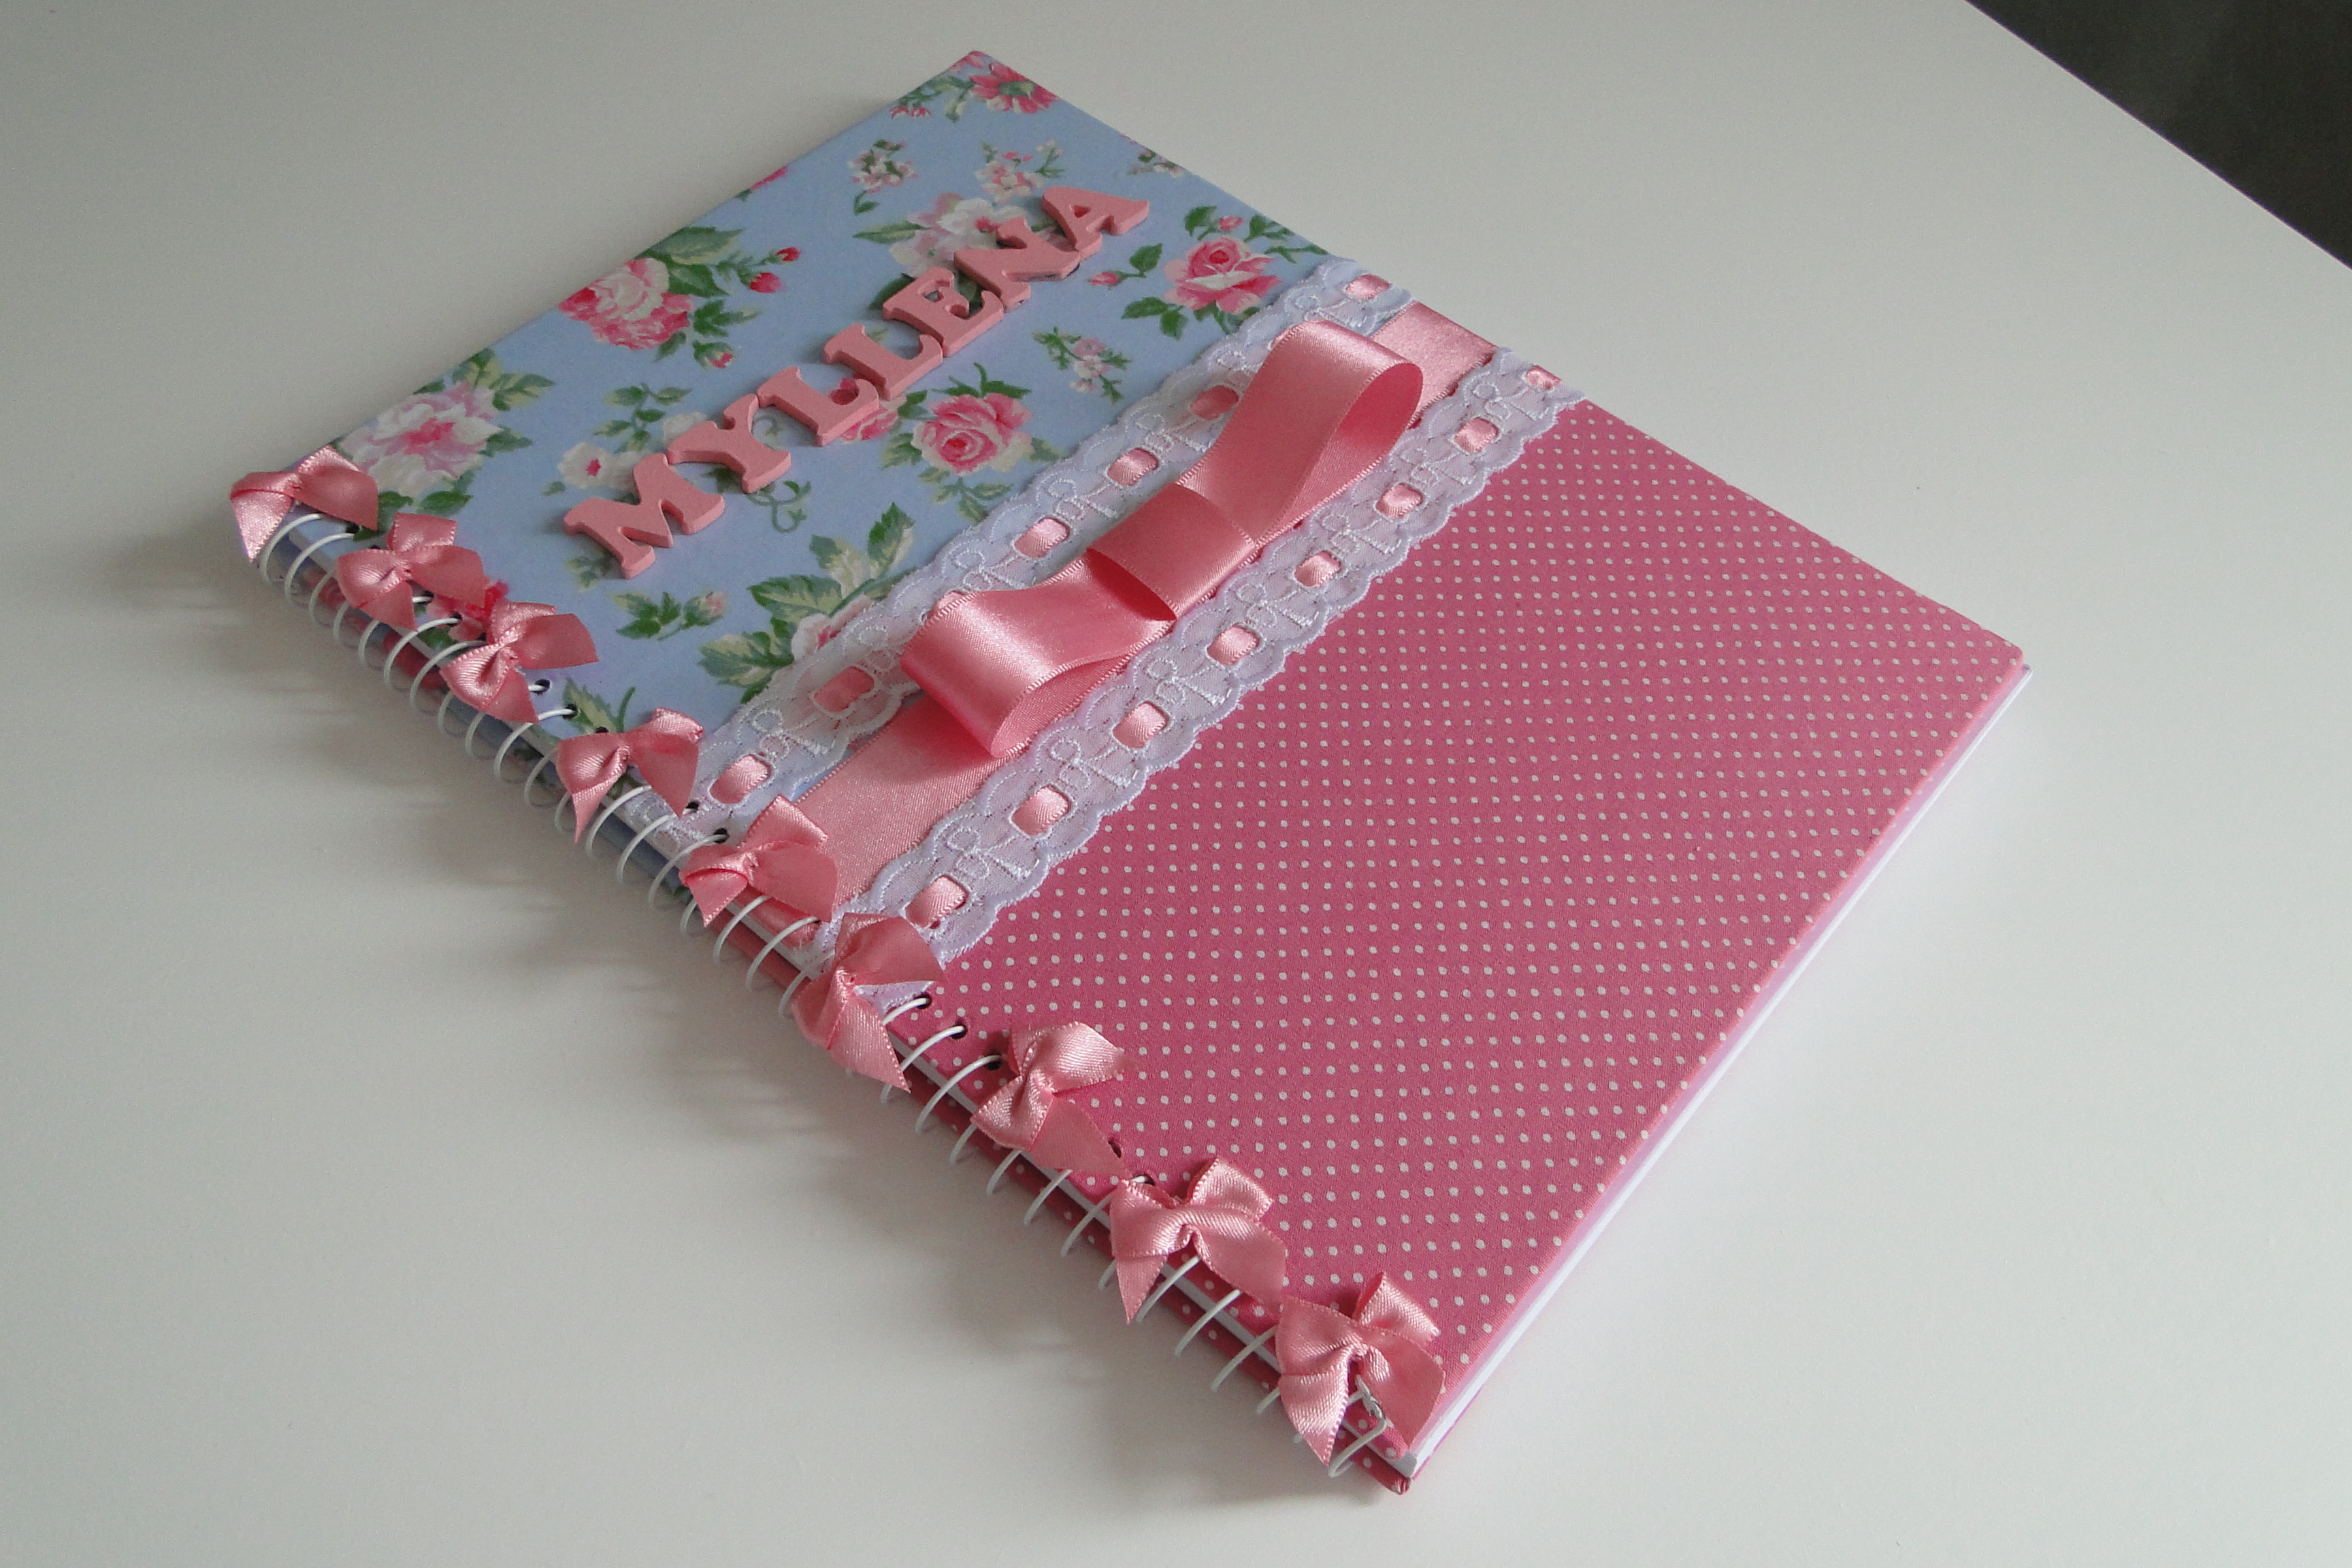 Amado Caderno Personalizado no Elo7 | Leslie Silva (2C8686) NG33